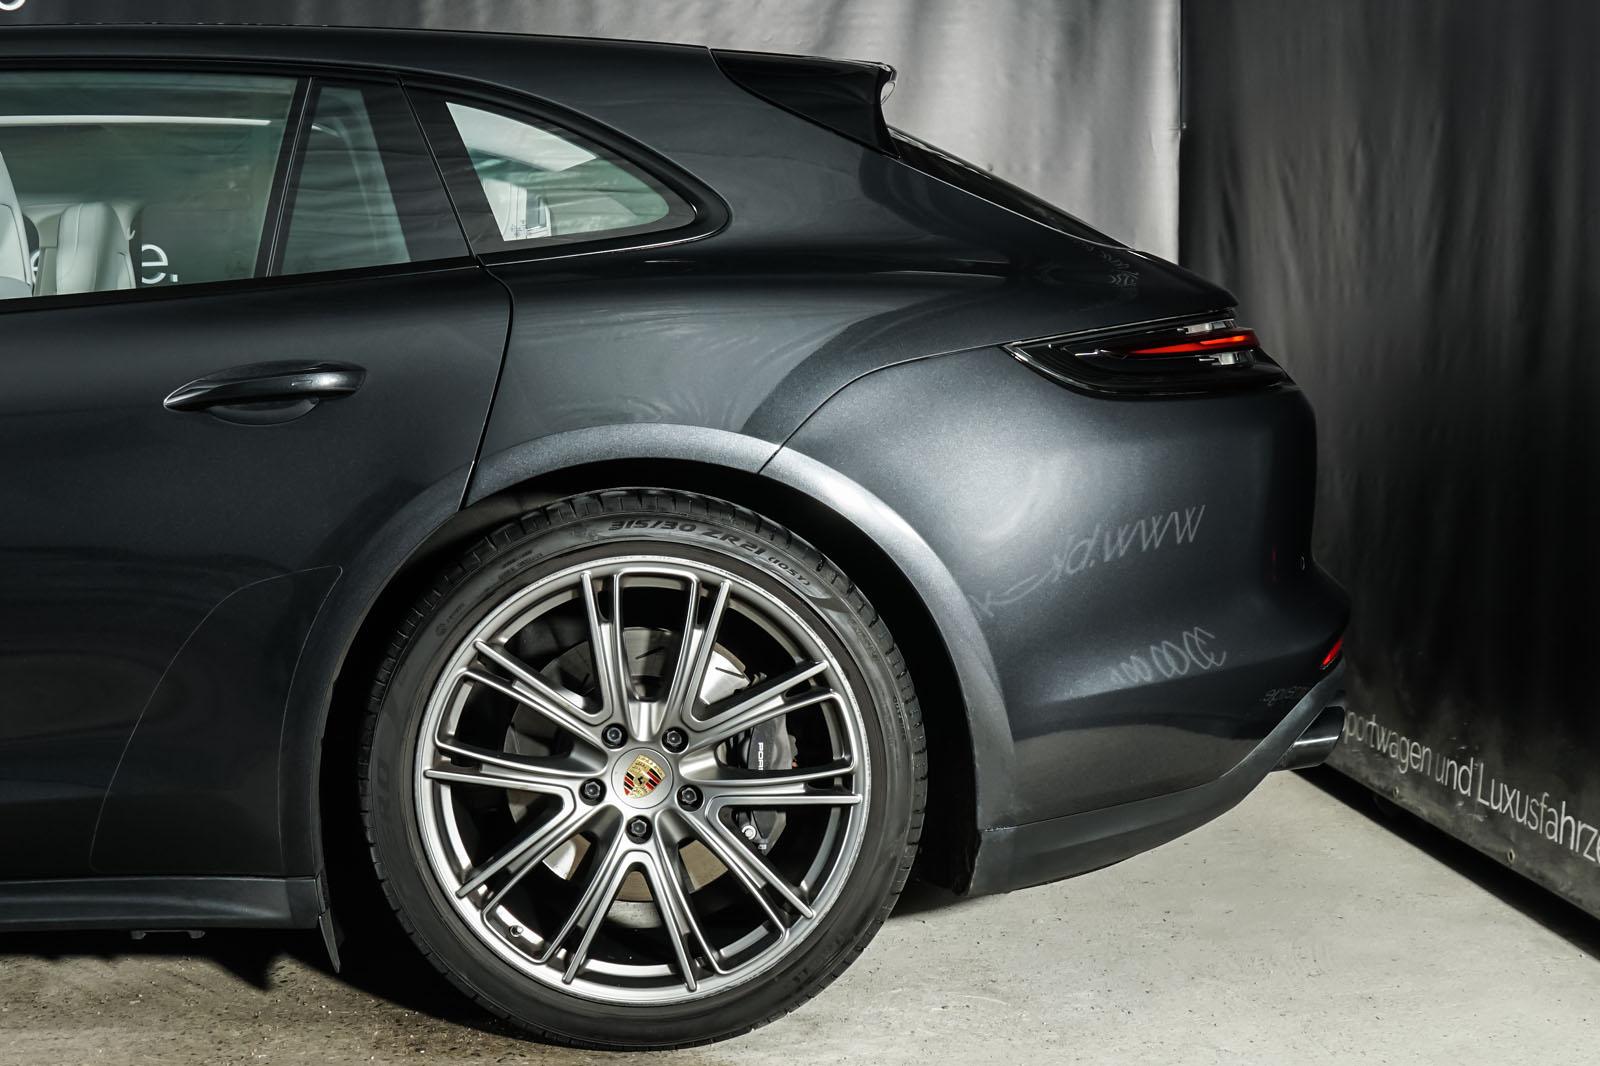 Porsche_Panamera4_SportTurismo_Grau_Weißgrau_POR-0979_5_w